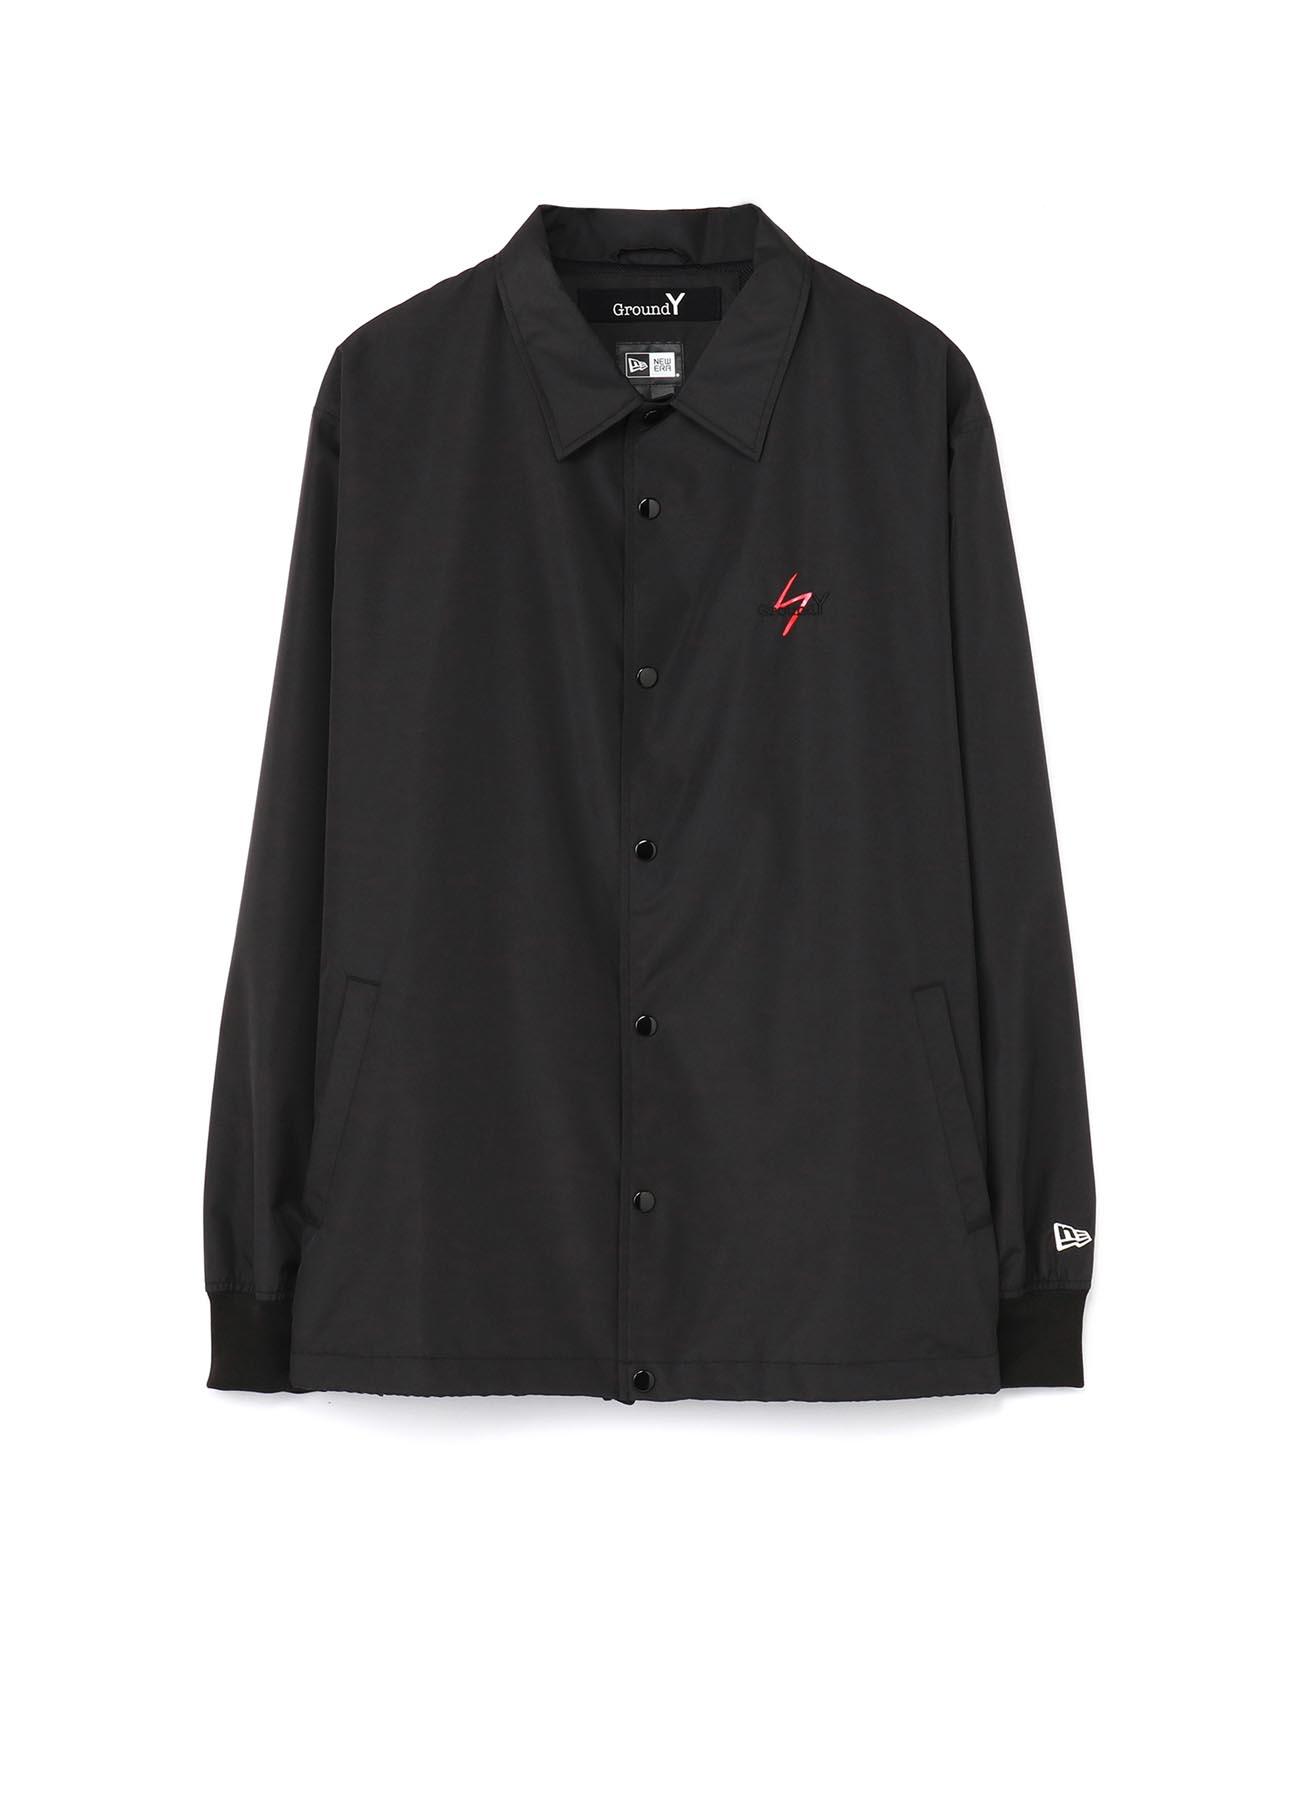 Ground Y×NEW ERA Collection Coach Jacket